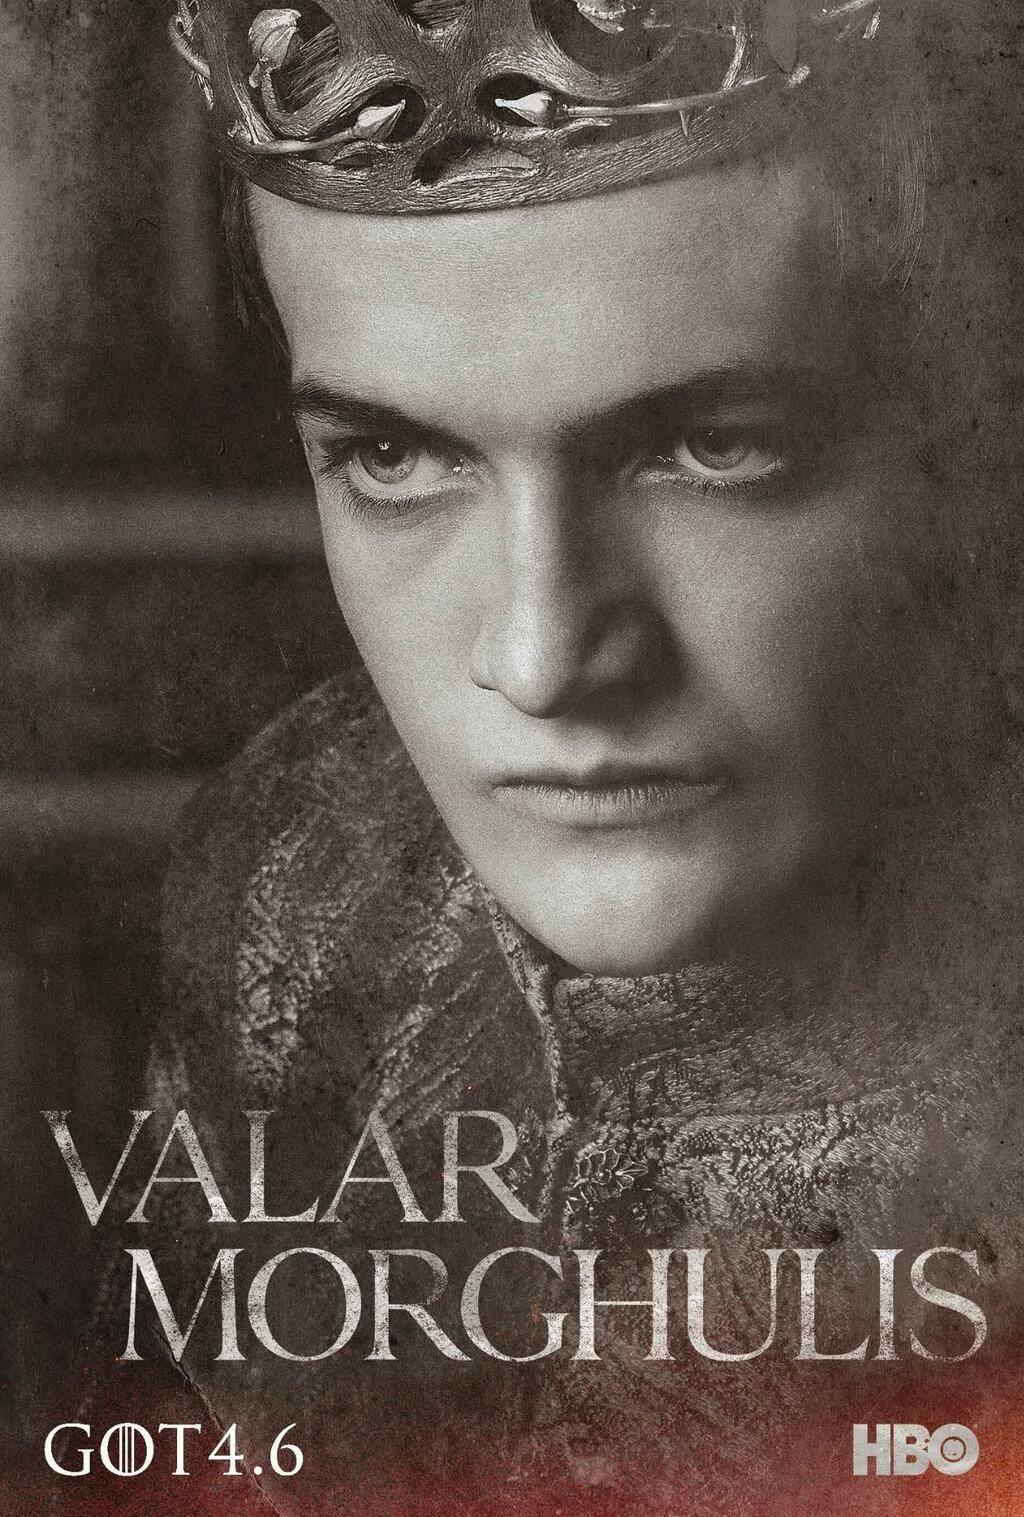 Got Poster For The New Season 6 April Joffrey Baratheon Valar